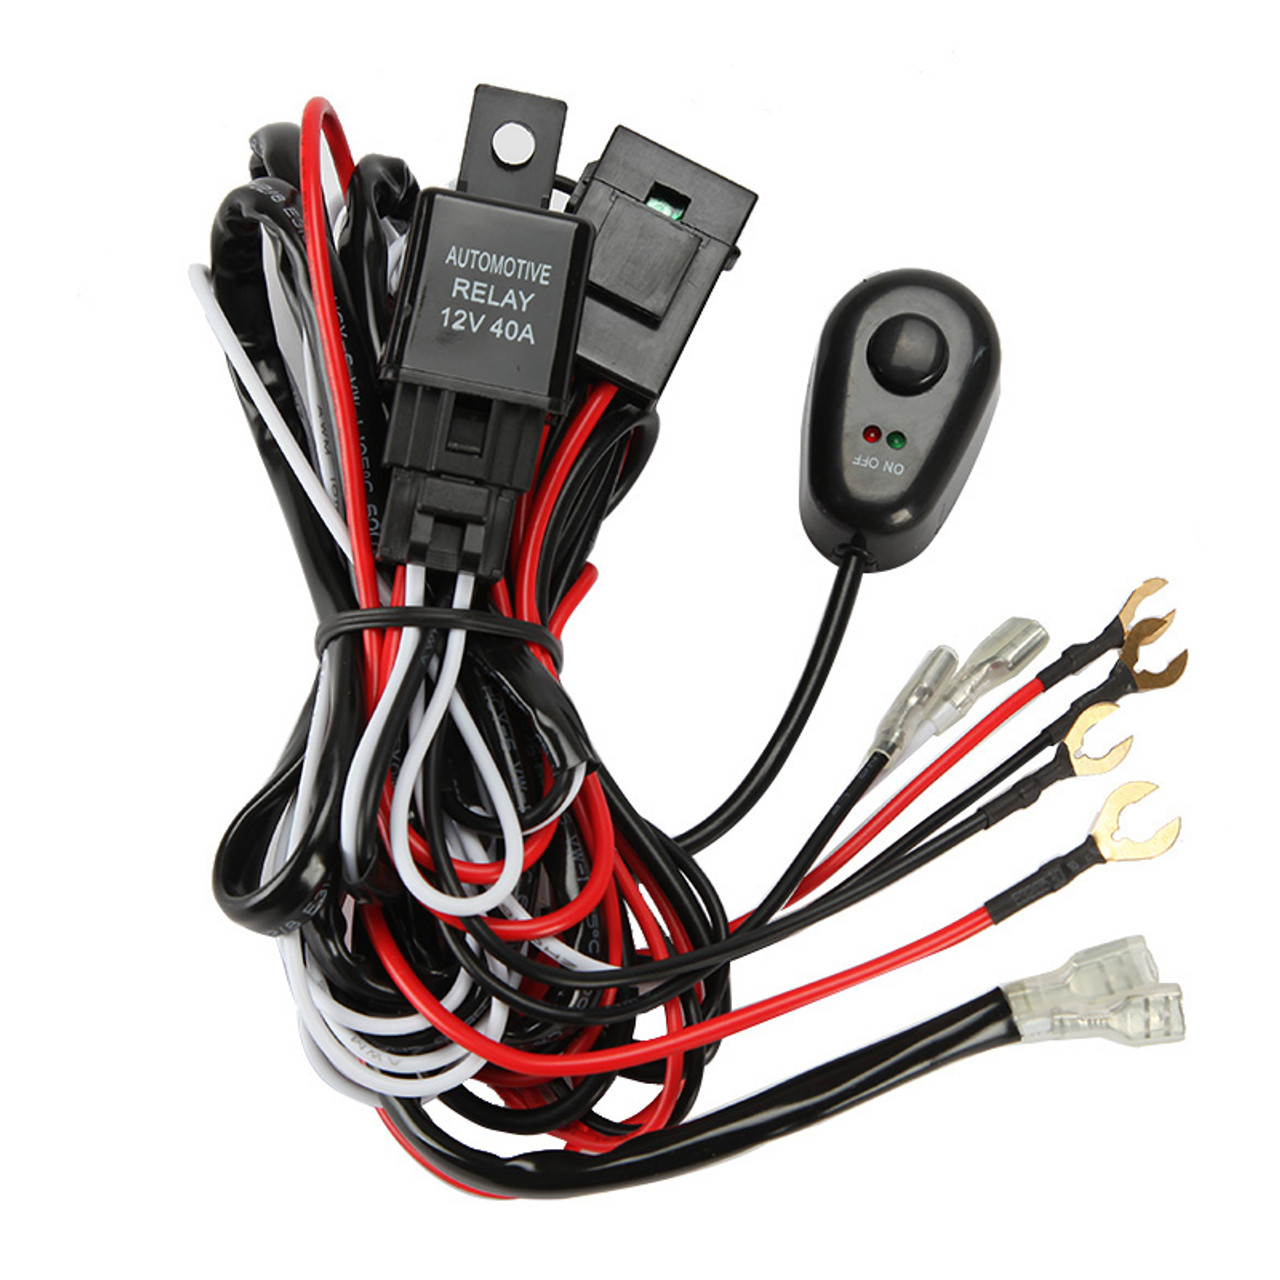 12v 40a led light bar wiring harness kit (dual lights